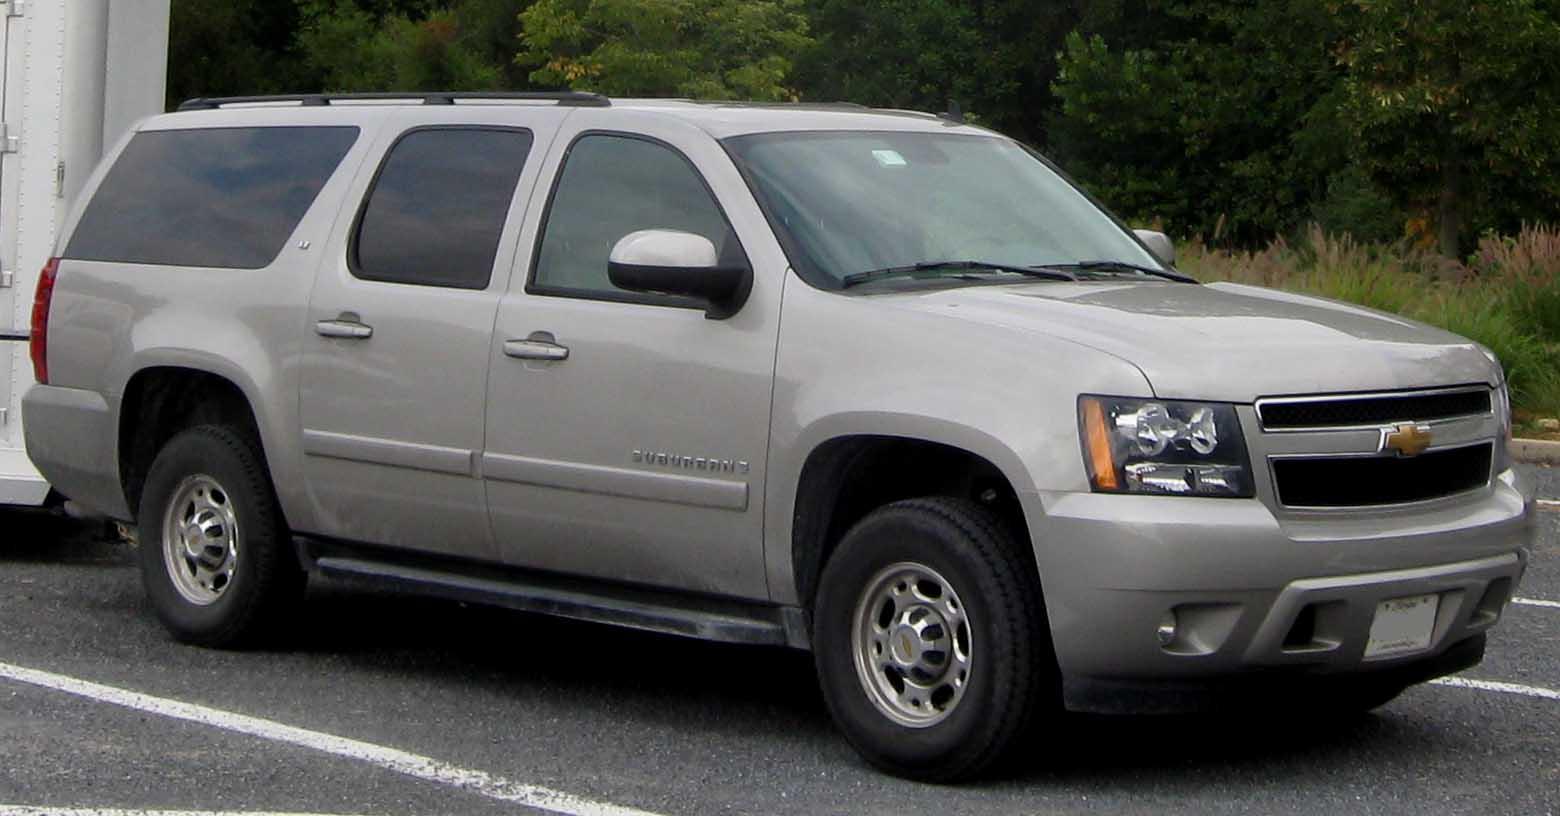 Chevrolet Suburban 2007 foto - 1